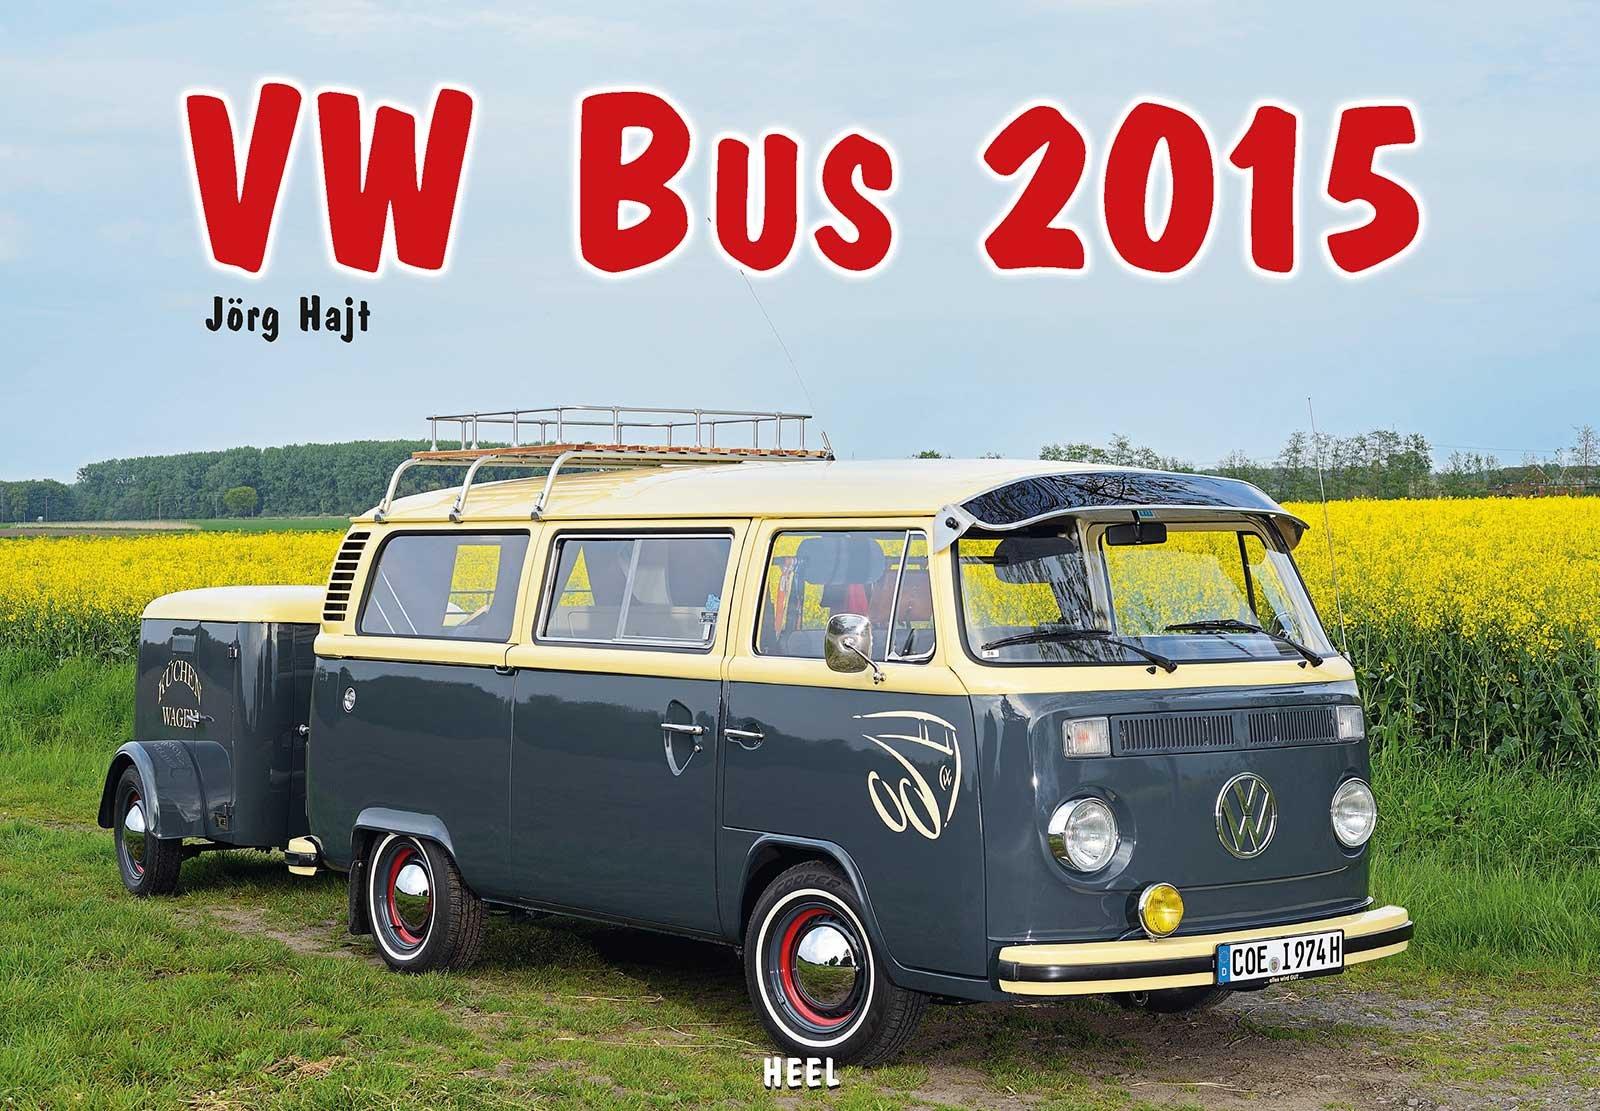 VW Bus 2015